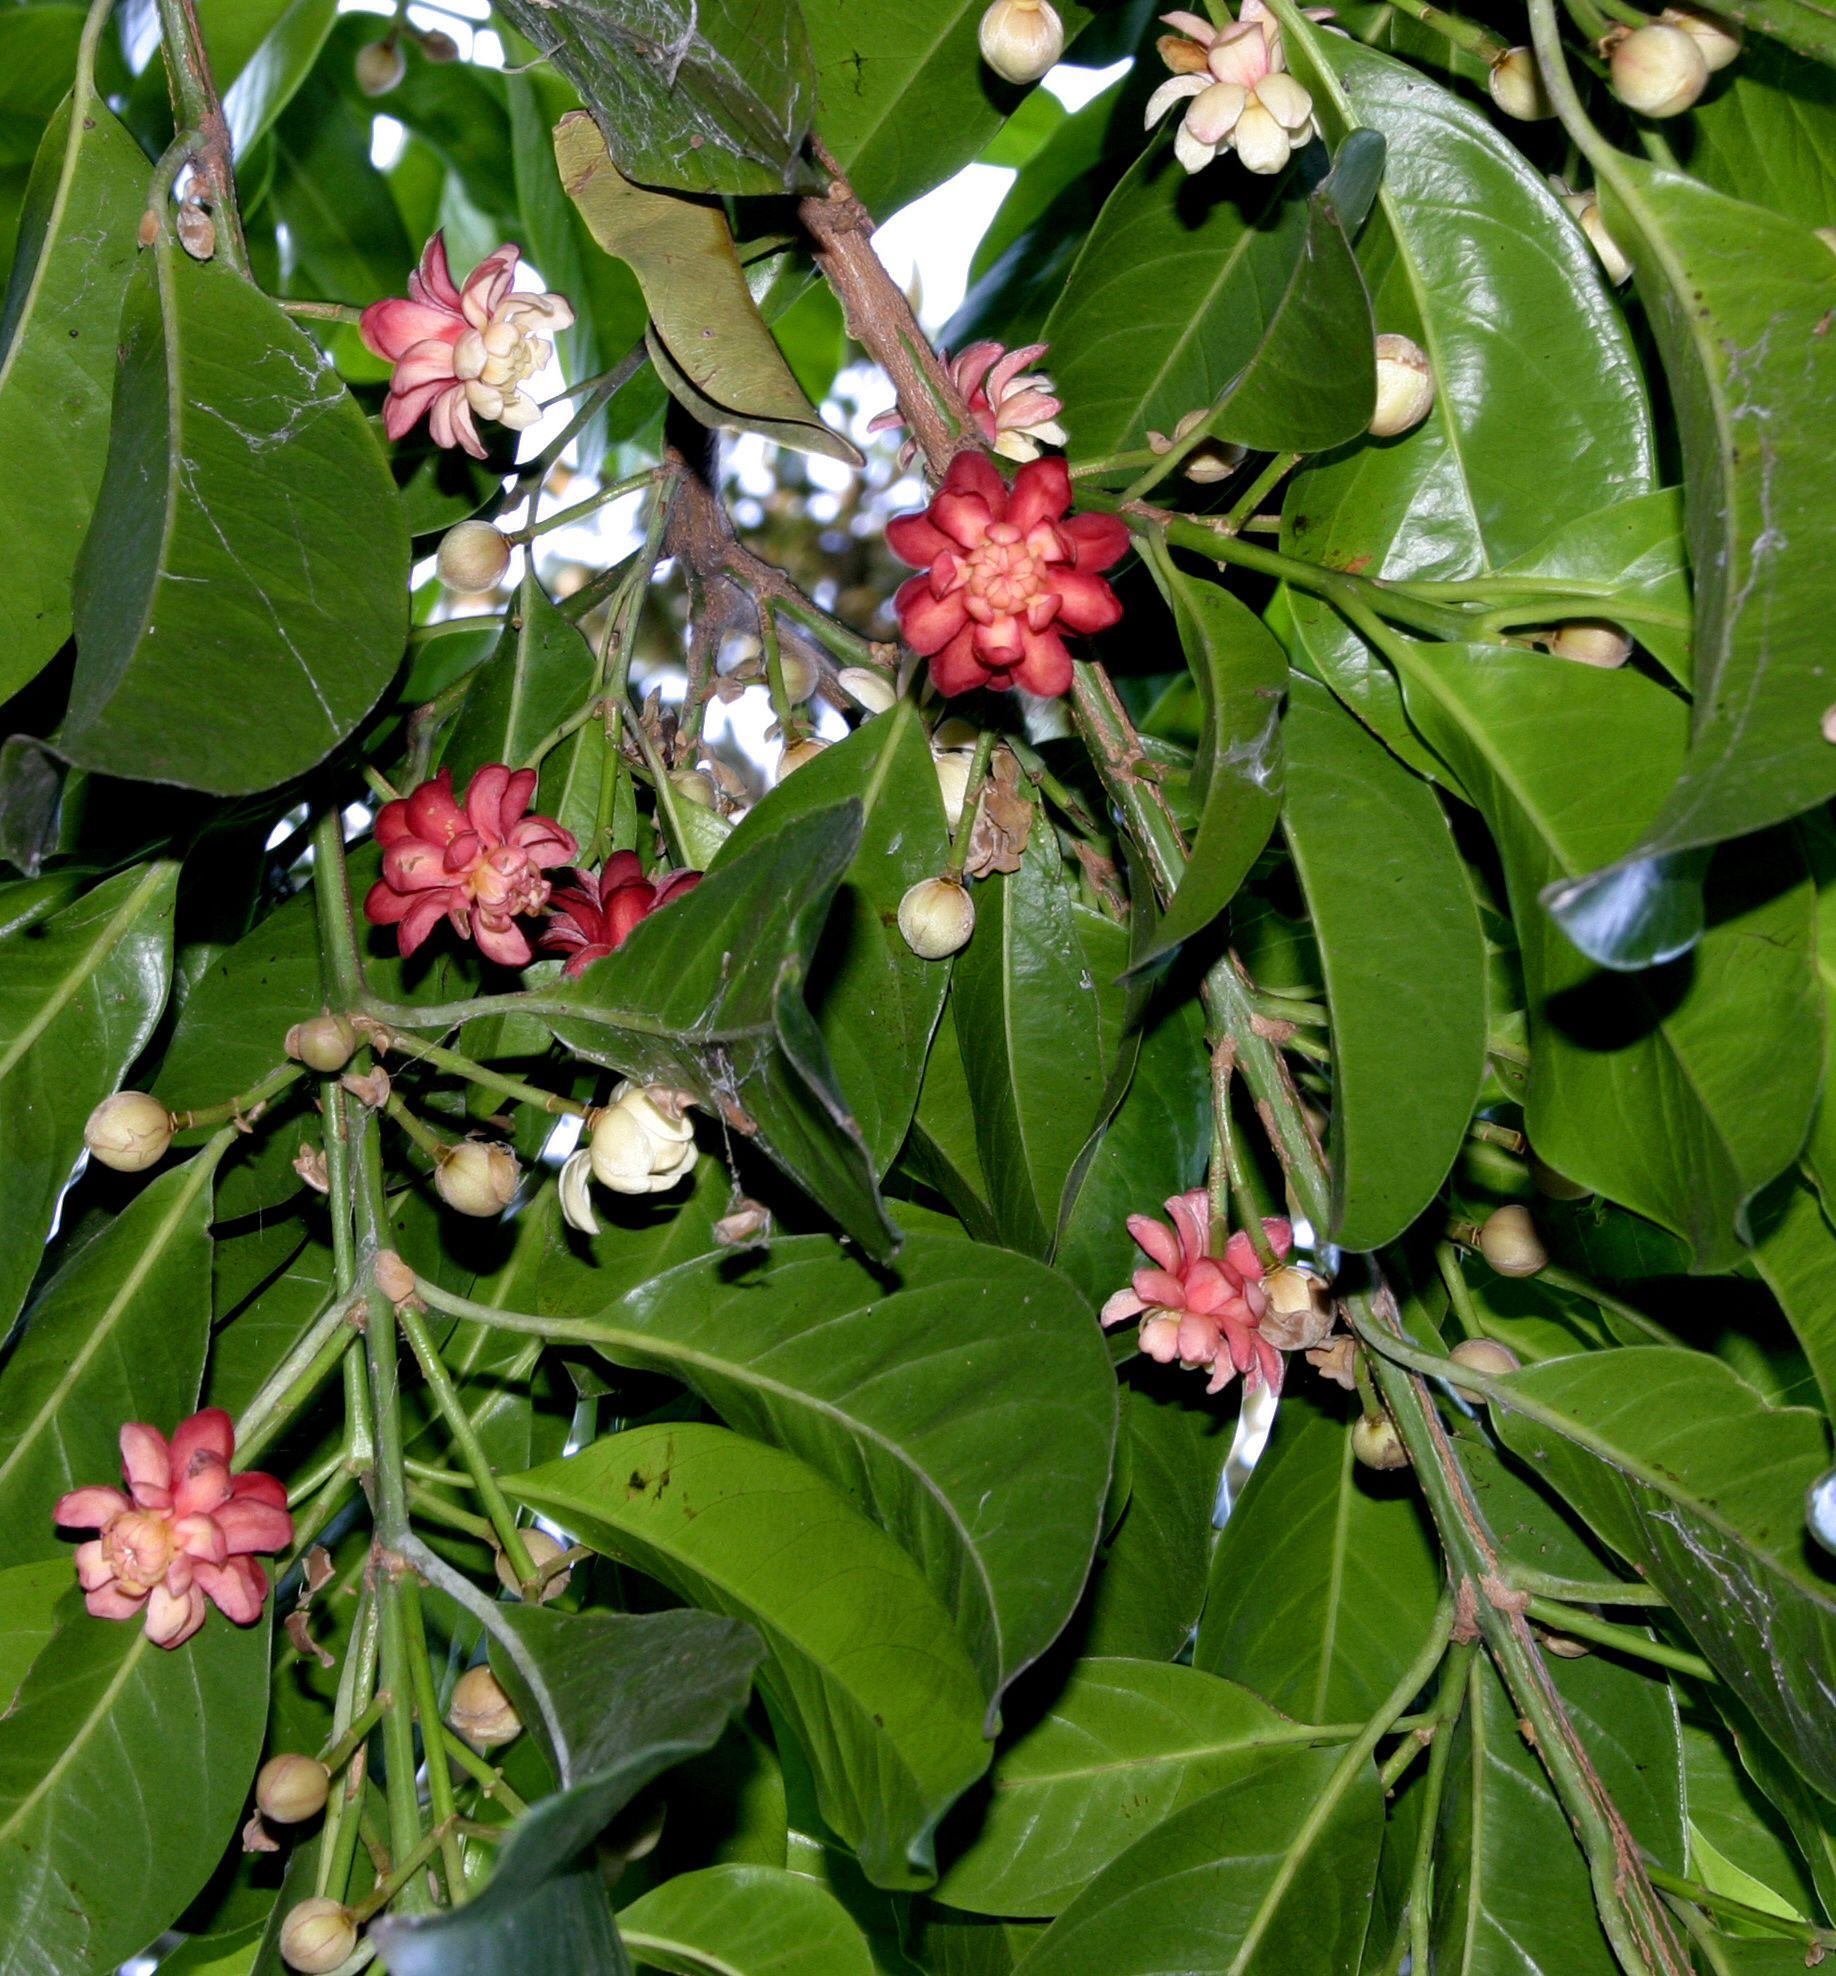 Native Plant Design: The Ribbonwood Tree (Idiospermum Australiense) Genus Of